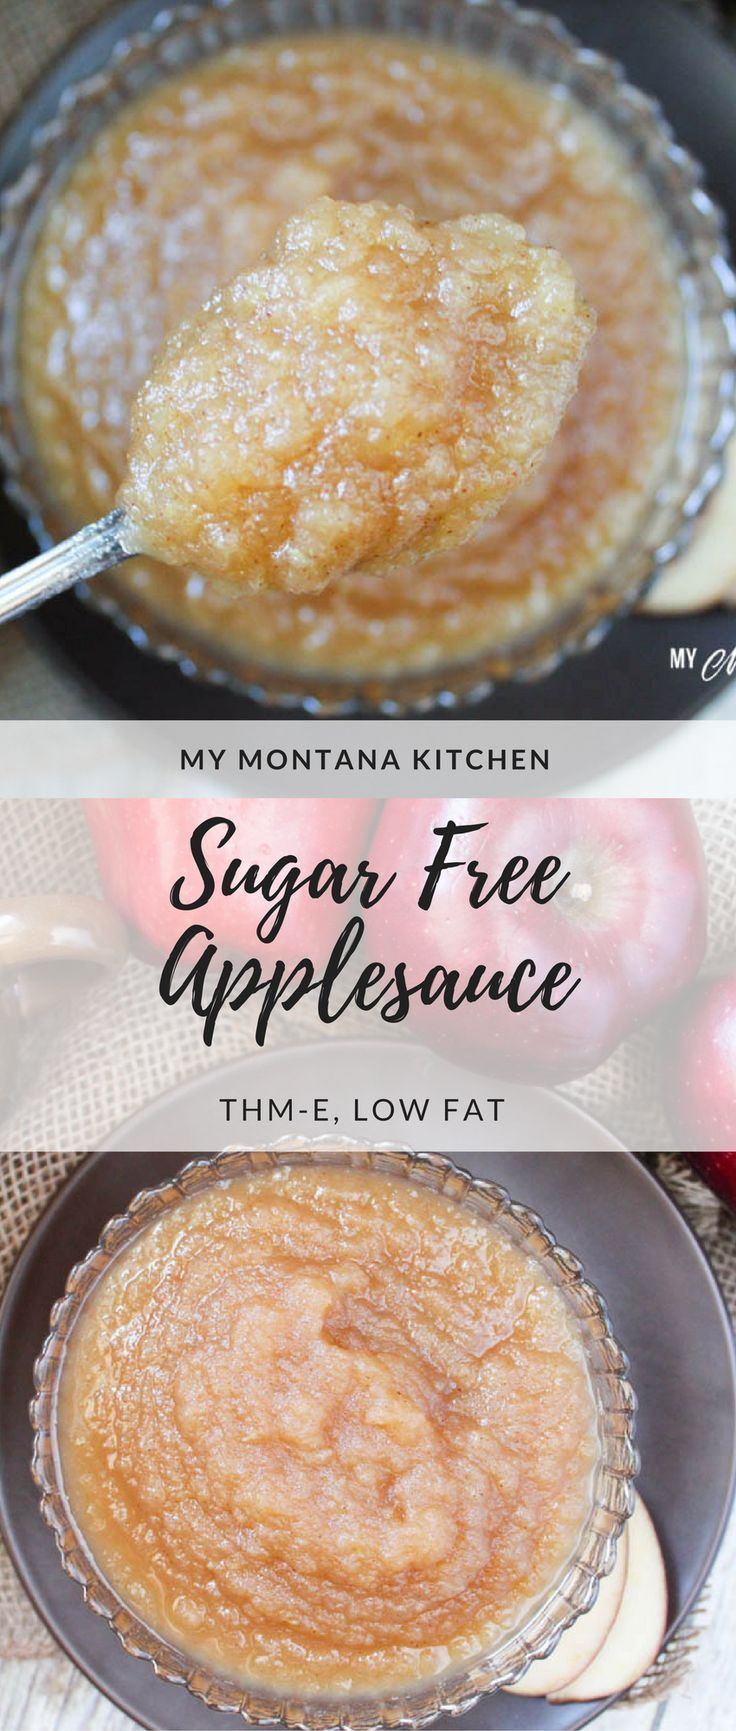 Sugar Free Applesauce (THM-E) #trimhealthymama #thm #thme #healthycarbs # sugarfree #applesauce